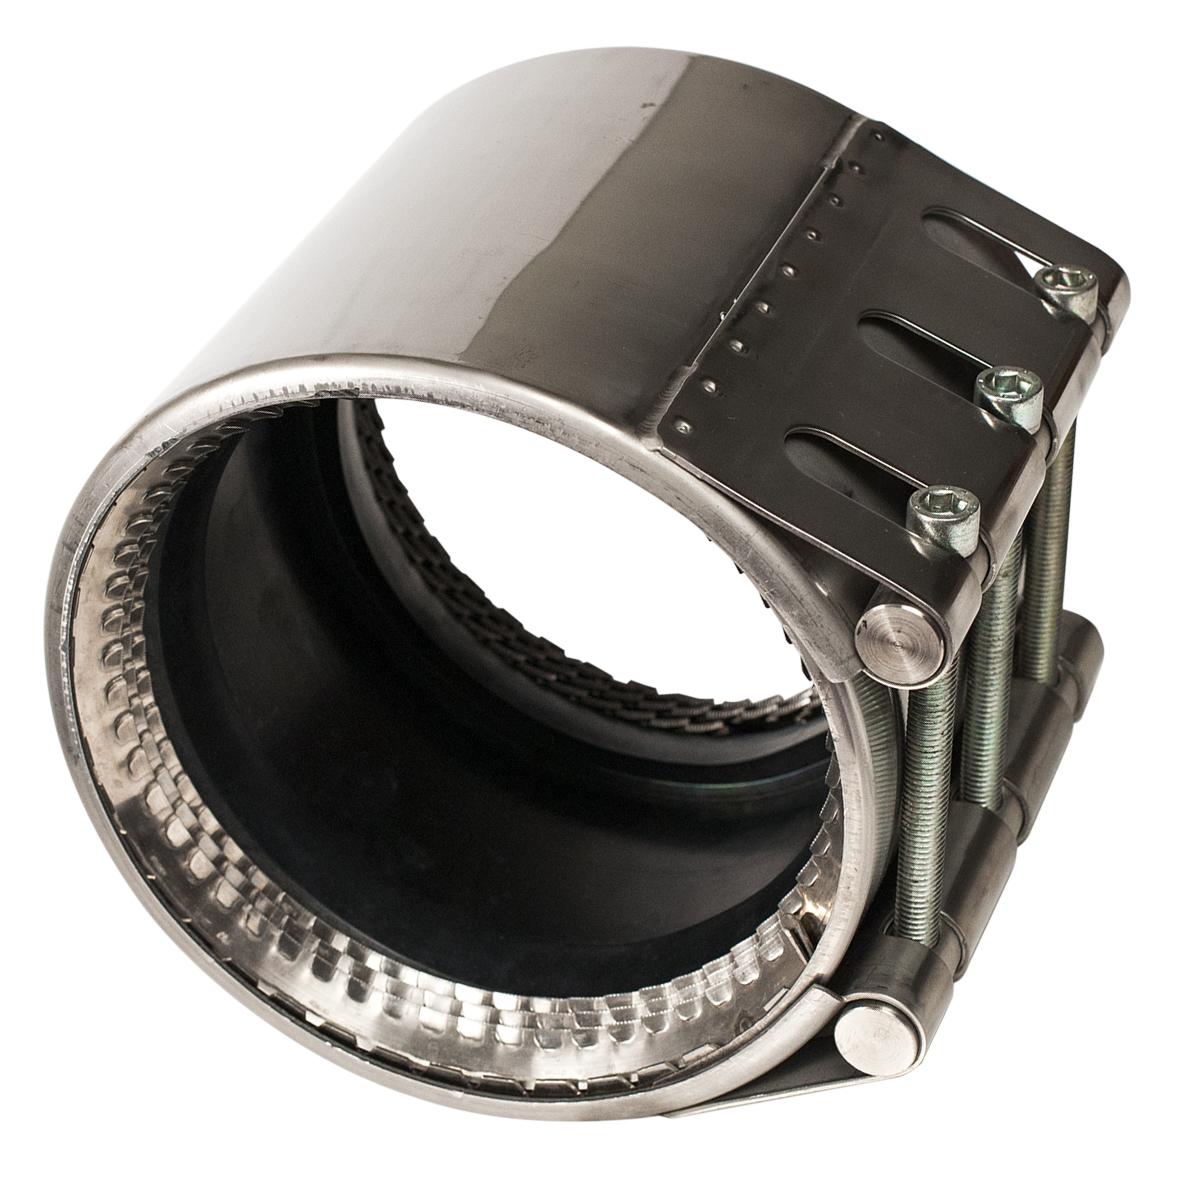 ARMOR LOCK - Stainless steel restraint coupling